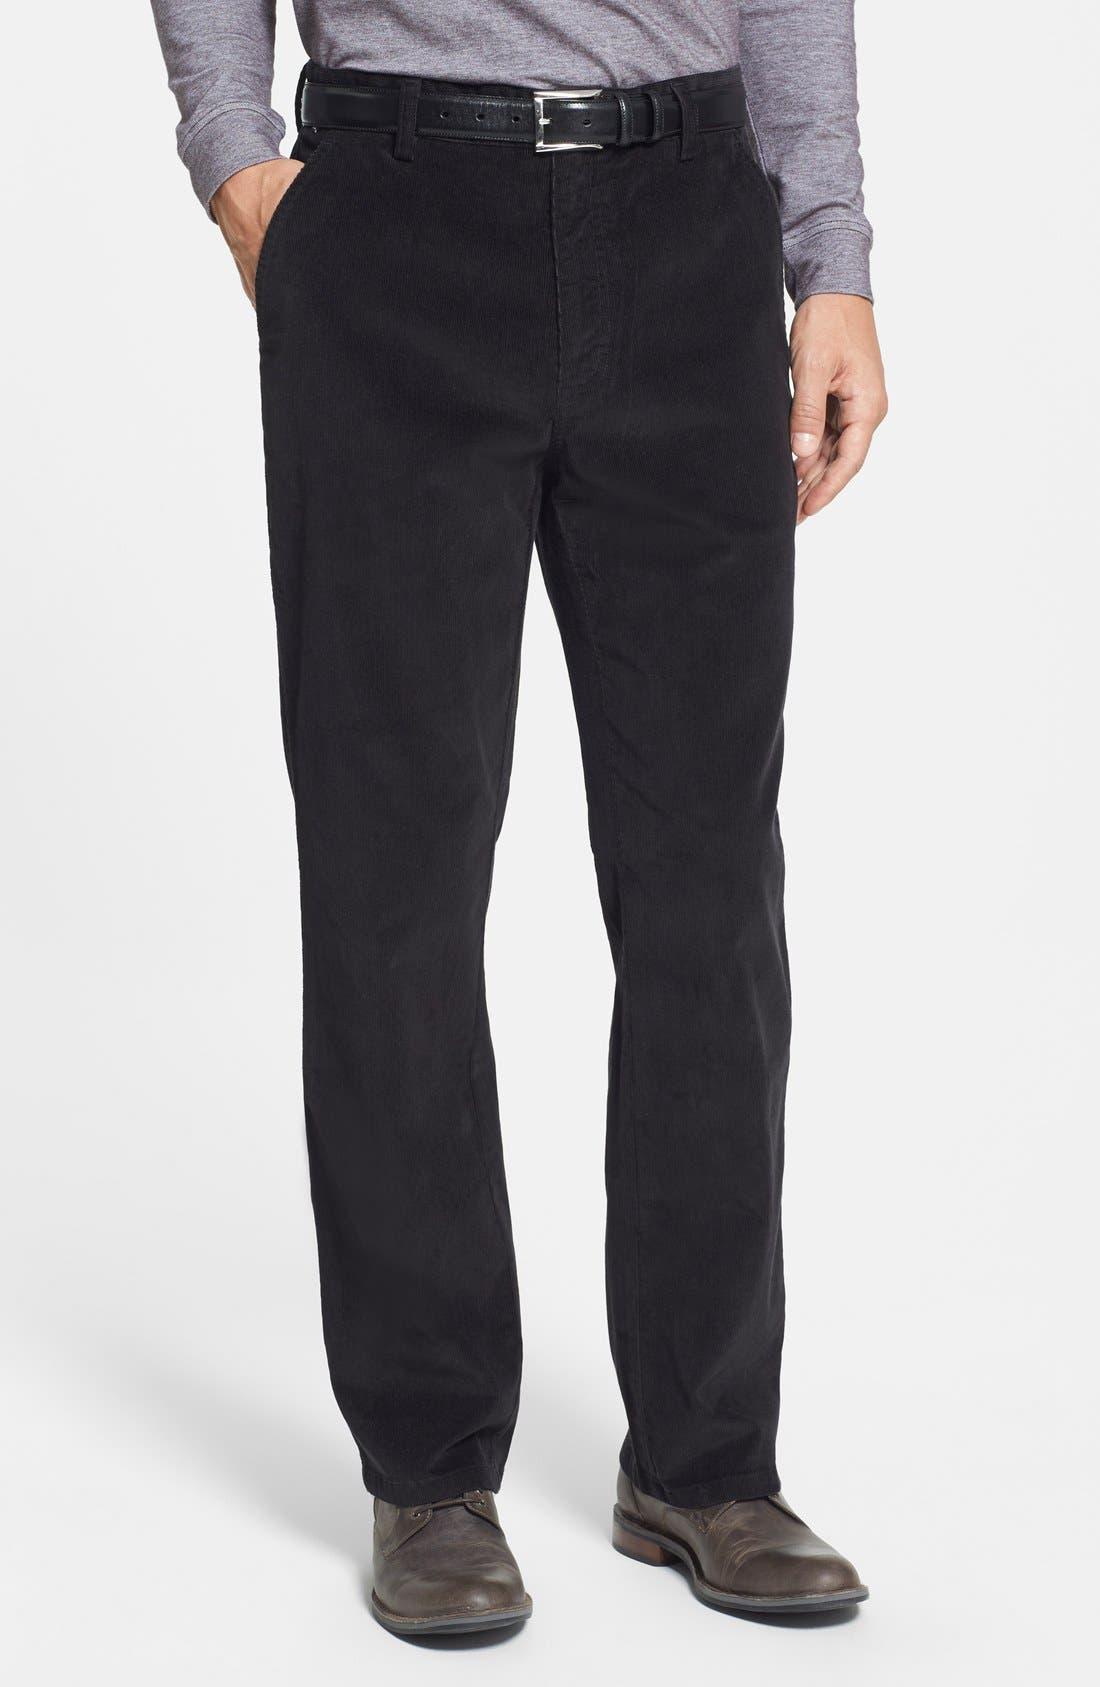 'Walker' Flat Front Straight Leg Corduroy Pants,                             Main thumbnail 1, color,                             001